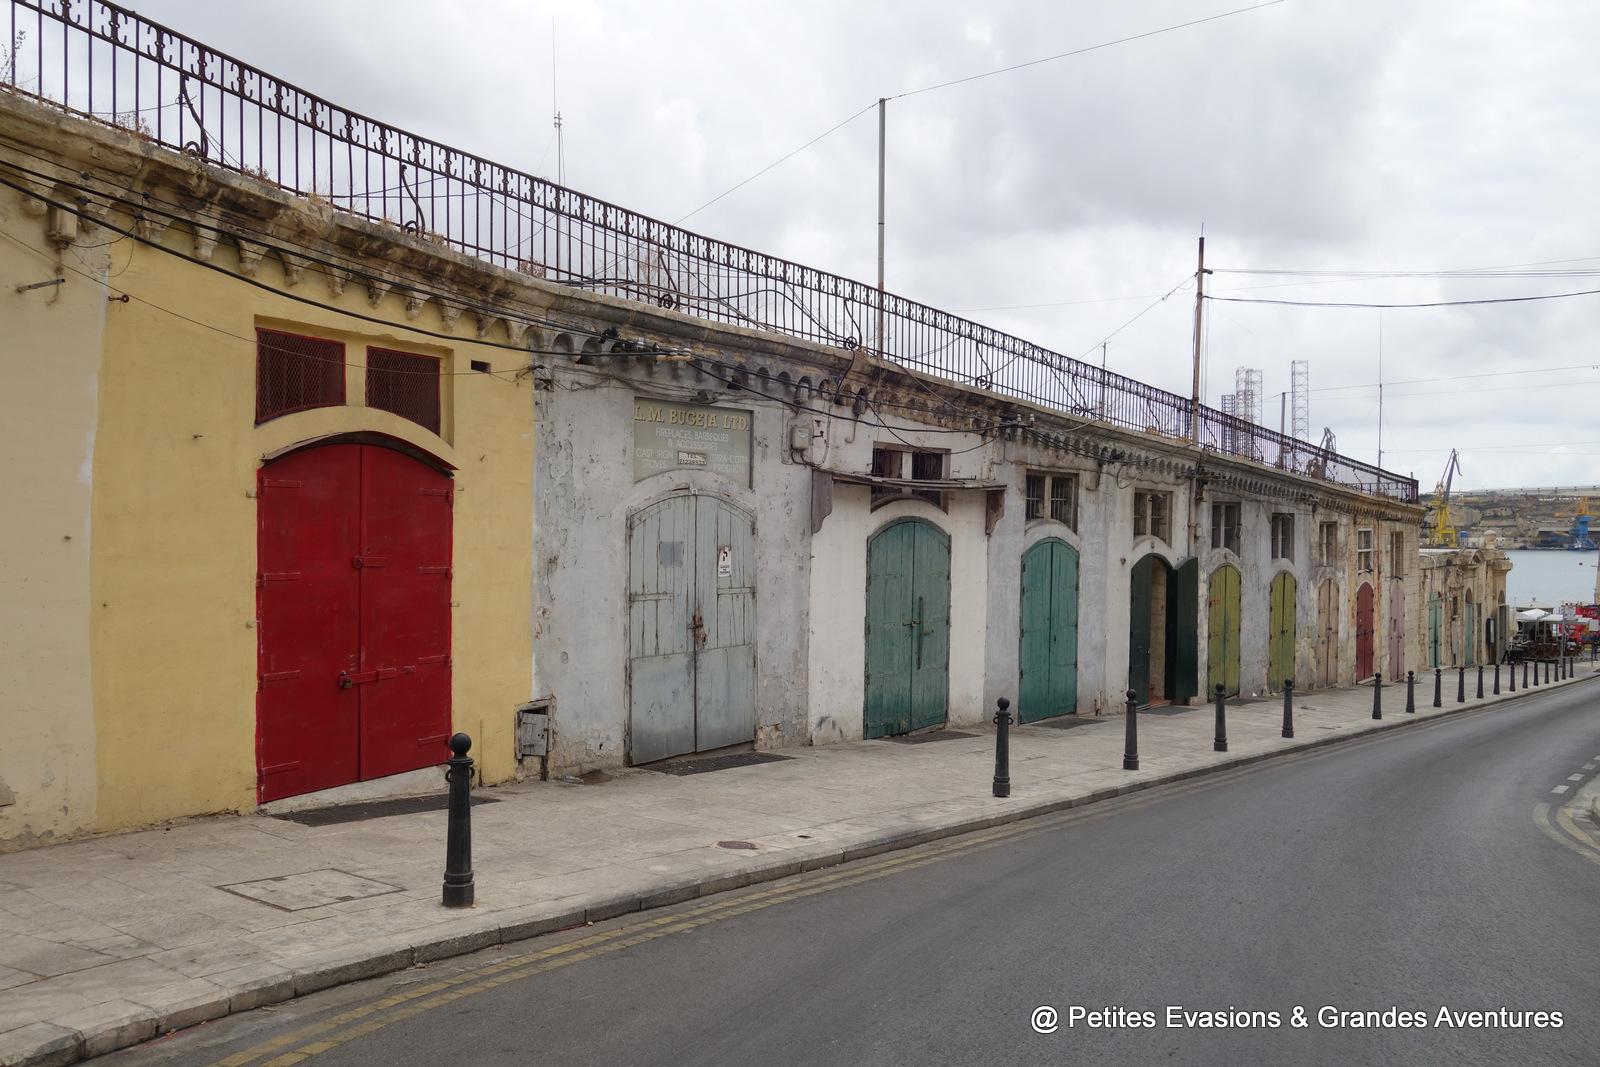 Portes multicolores à La Valette (Malte)